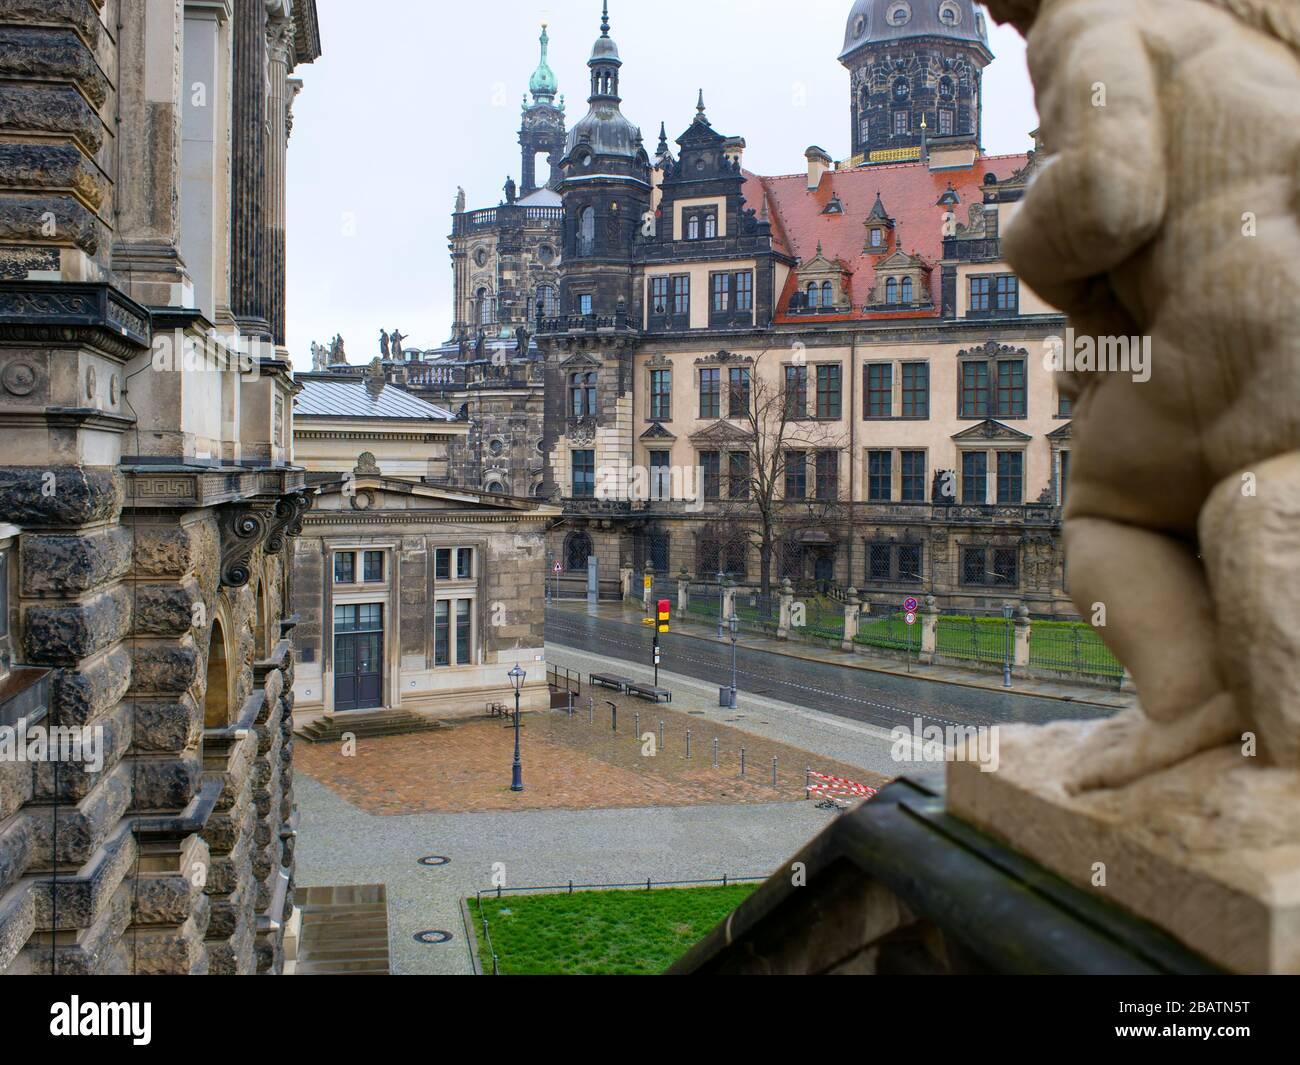 Blick vom Dresdner Zwinger auf das Residenzschloss während Coronavirus Lockdown 2020 im Regen Stock Photo